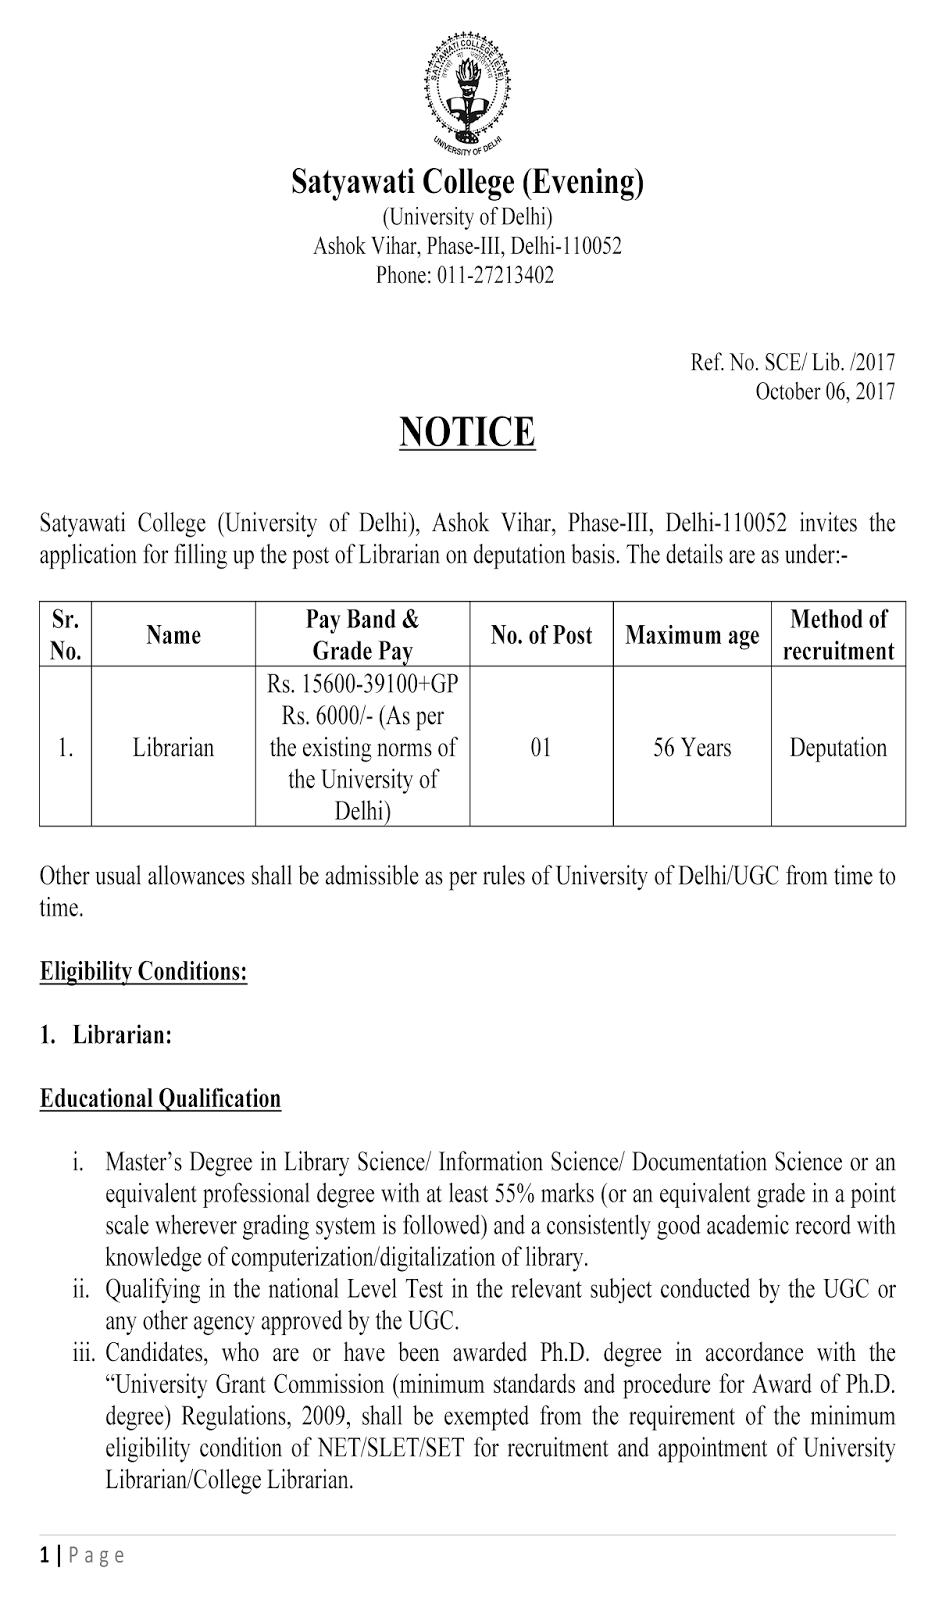 Librarian vacancy on deputation at satyawati college evening university of delhi